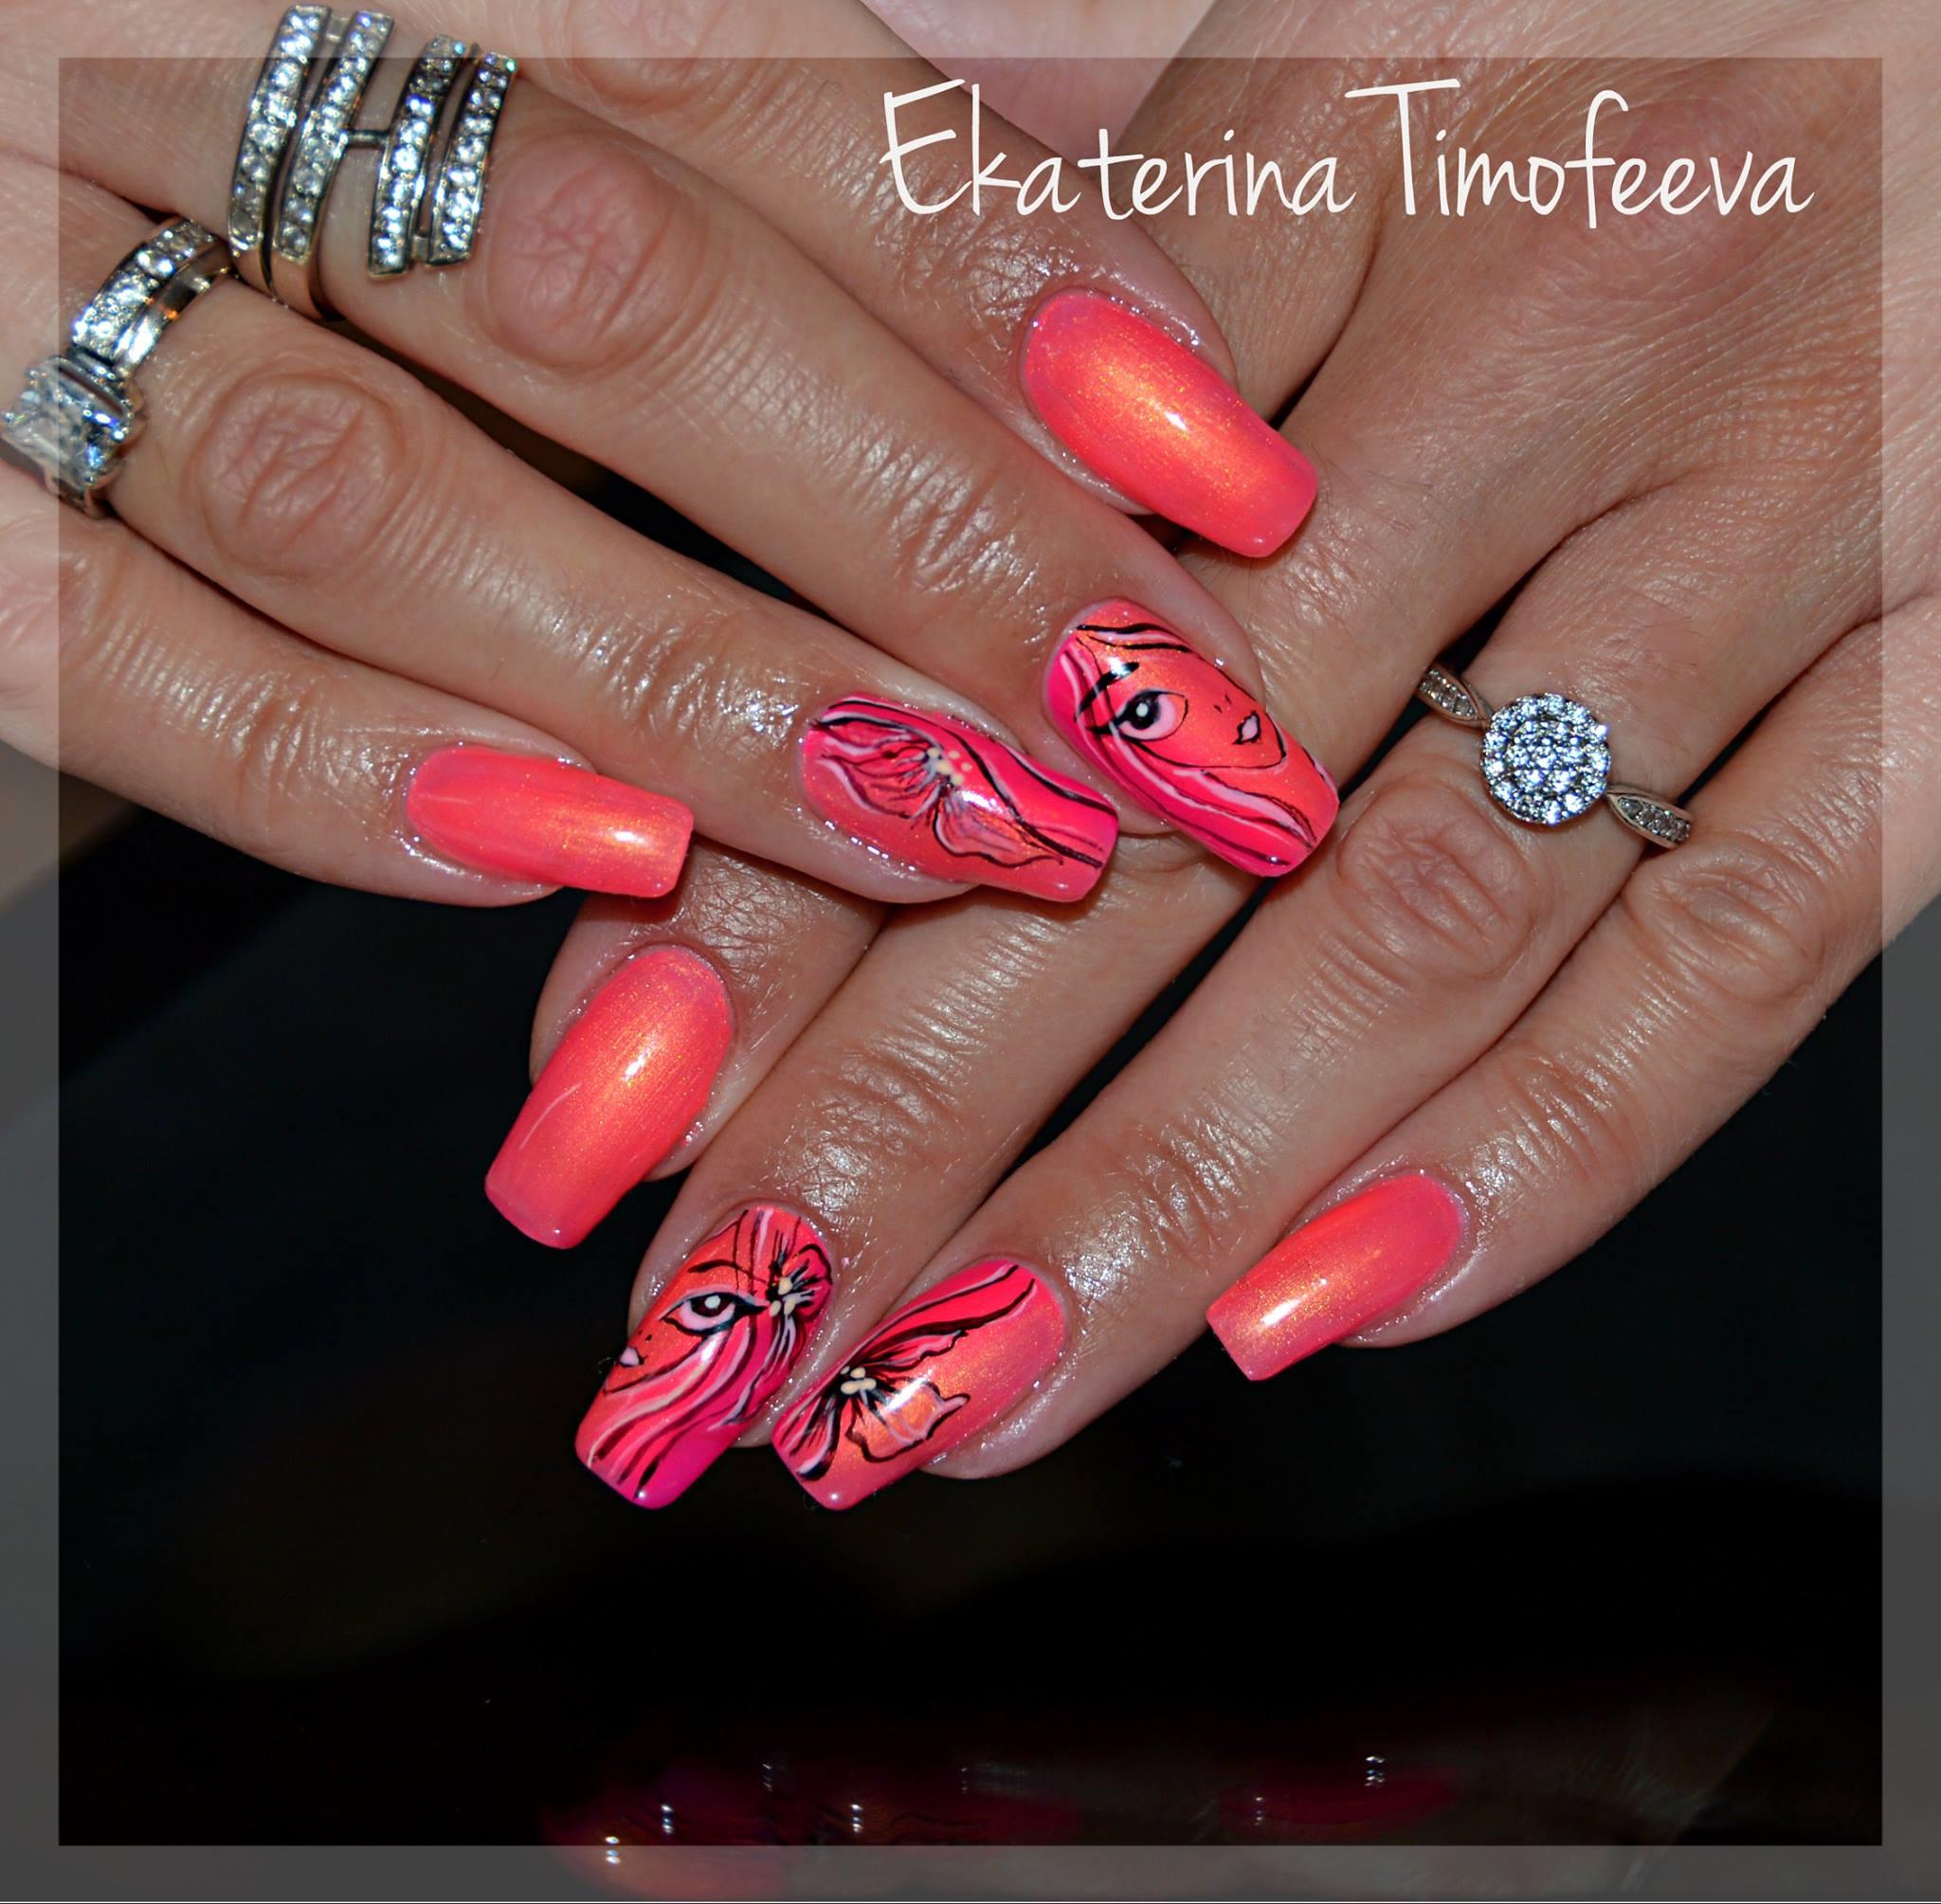 Fall Color Nail Designs - Nails Gallery